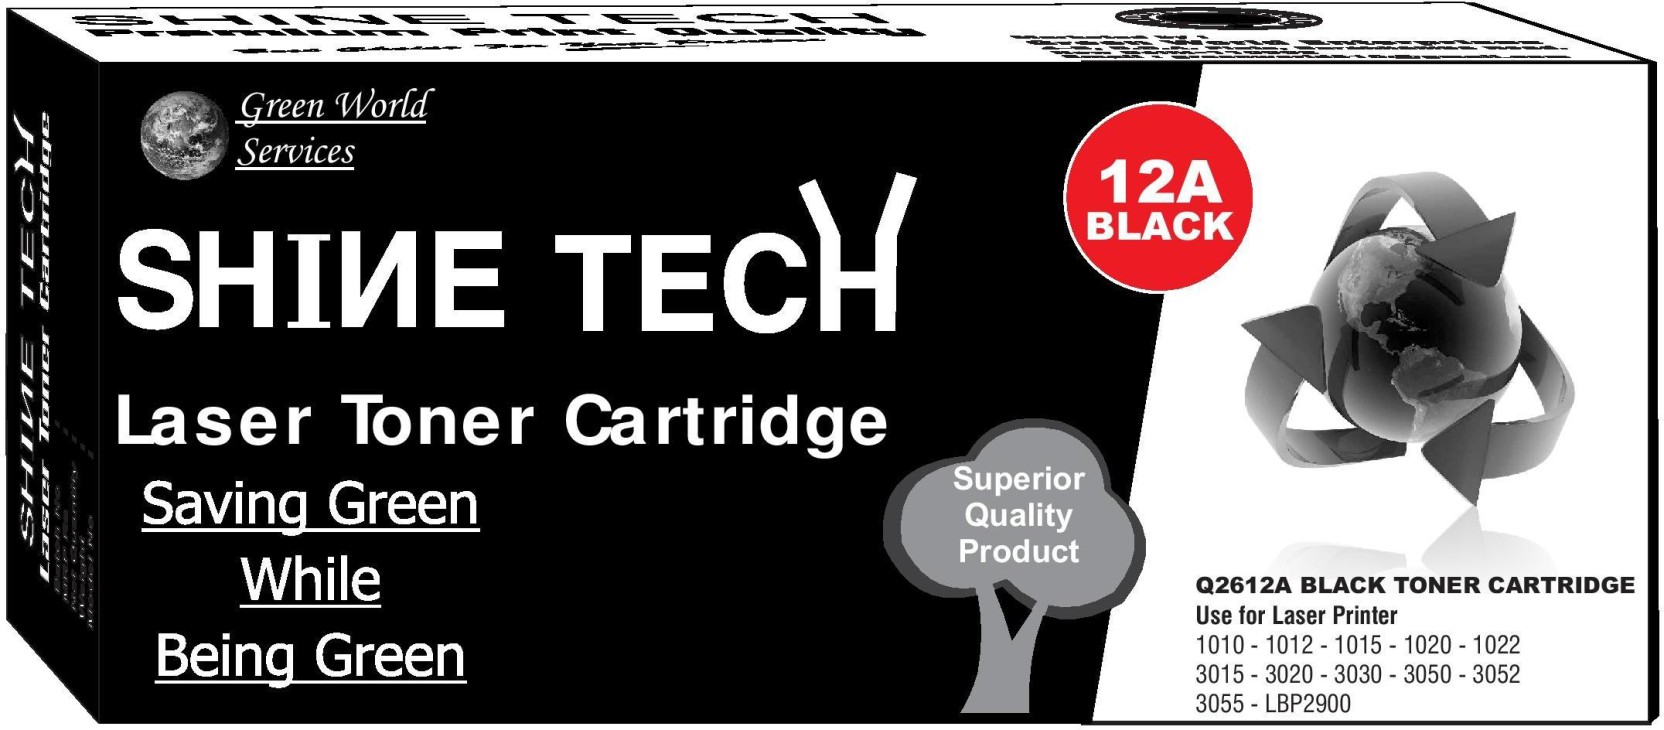 Shine Tech Hp 12a Compatiblehp Laserjet Printers 1010 1012 1015 Toner Cartridge Compatible 1020 Compare